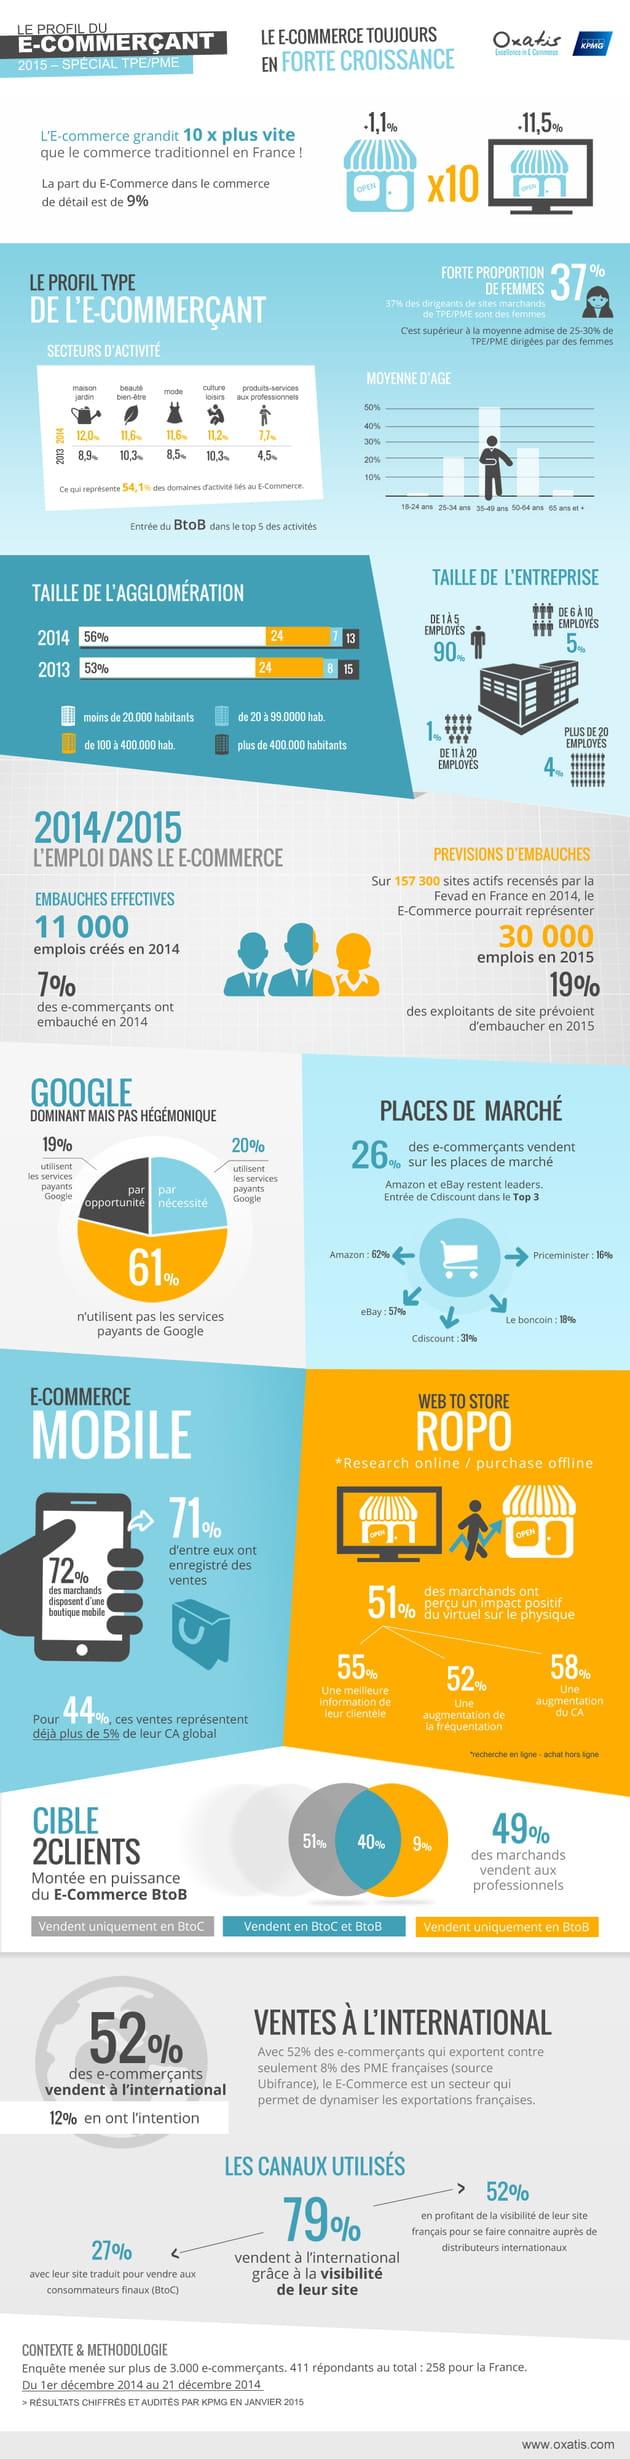 infographie oxatis